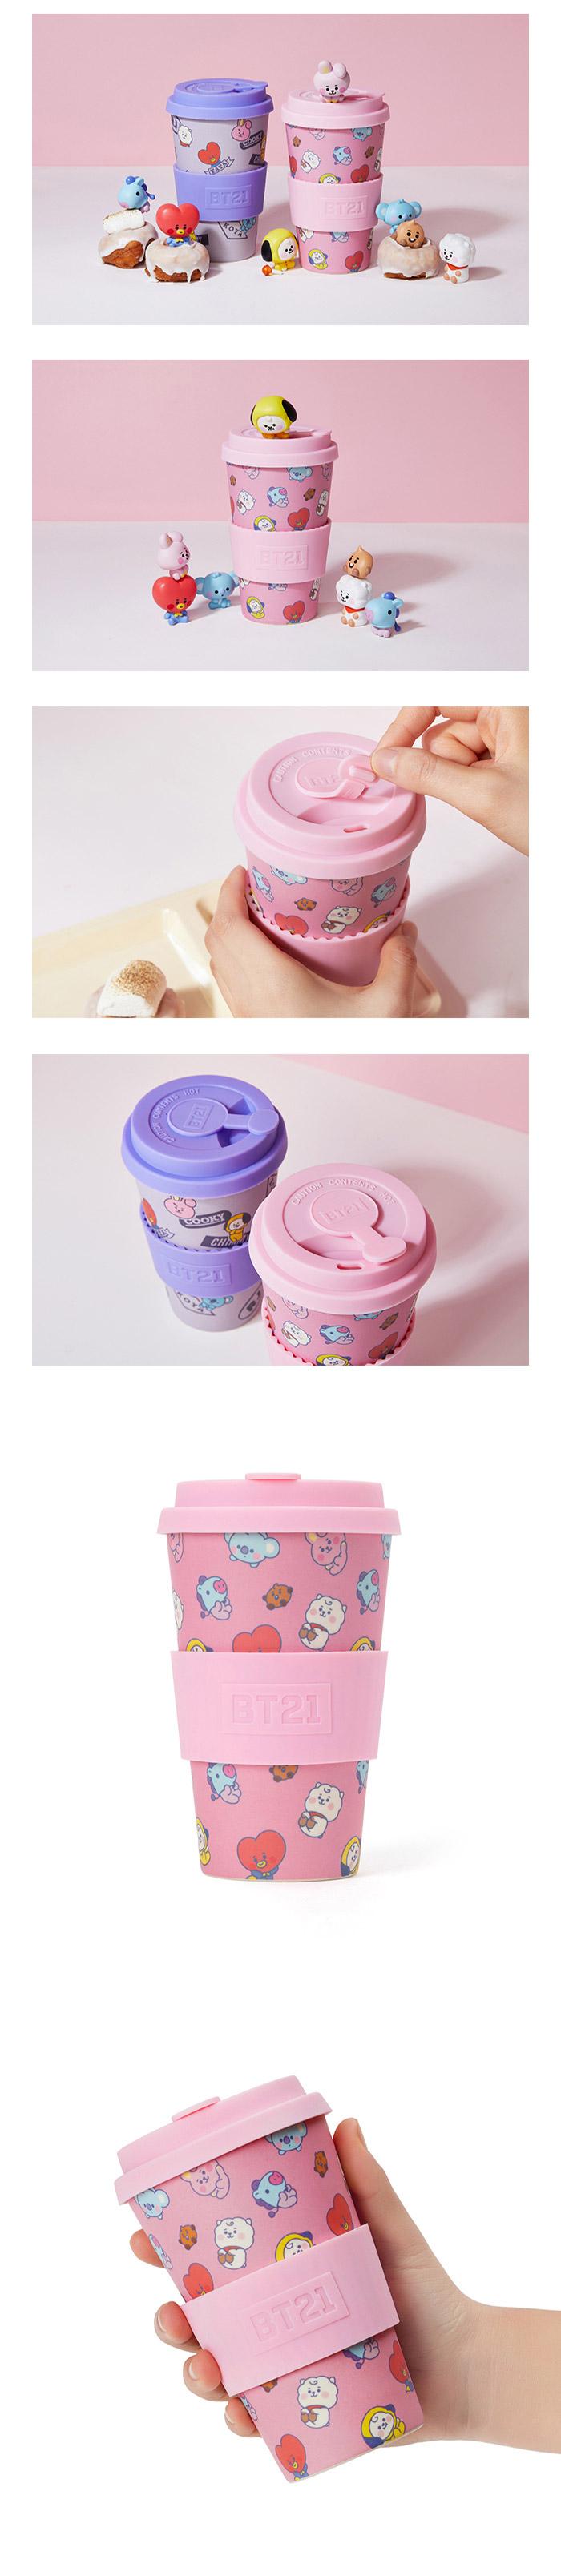 BT21] BTS Line Friends Collaboration - Baby Reusable Cup